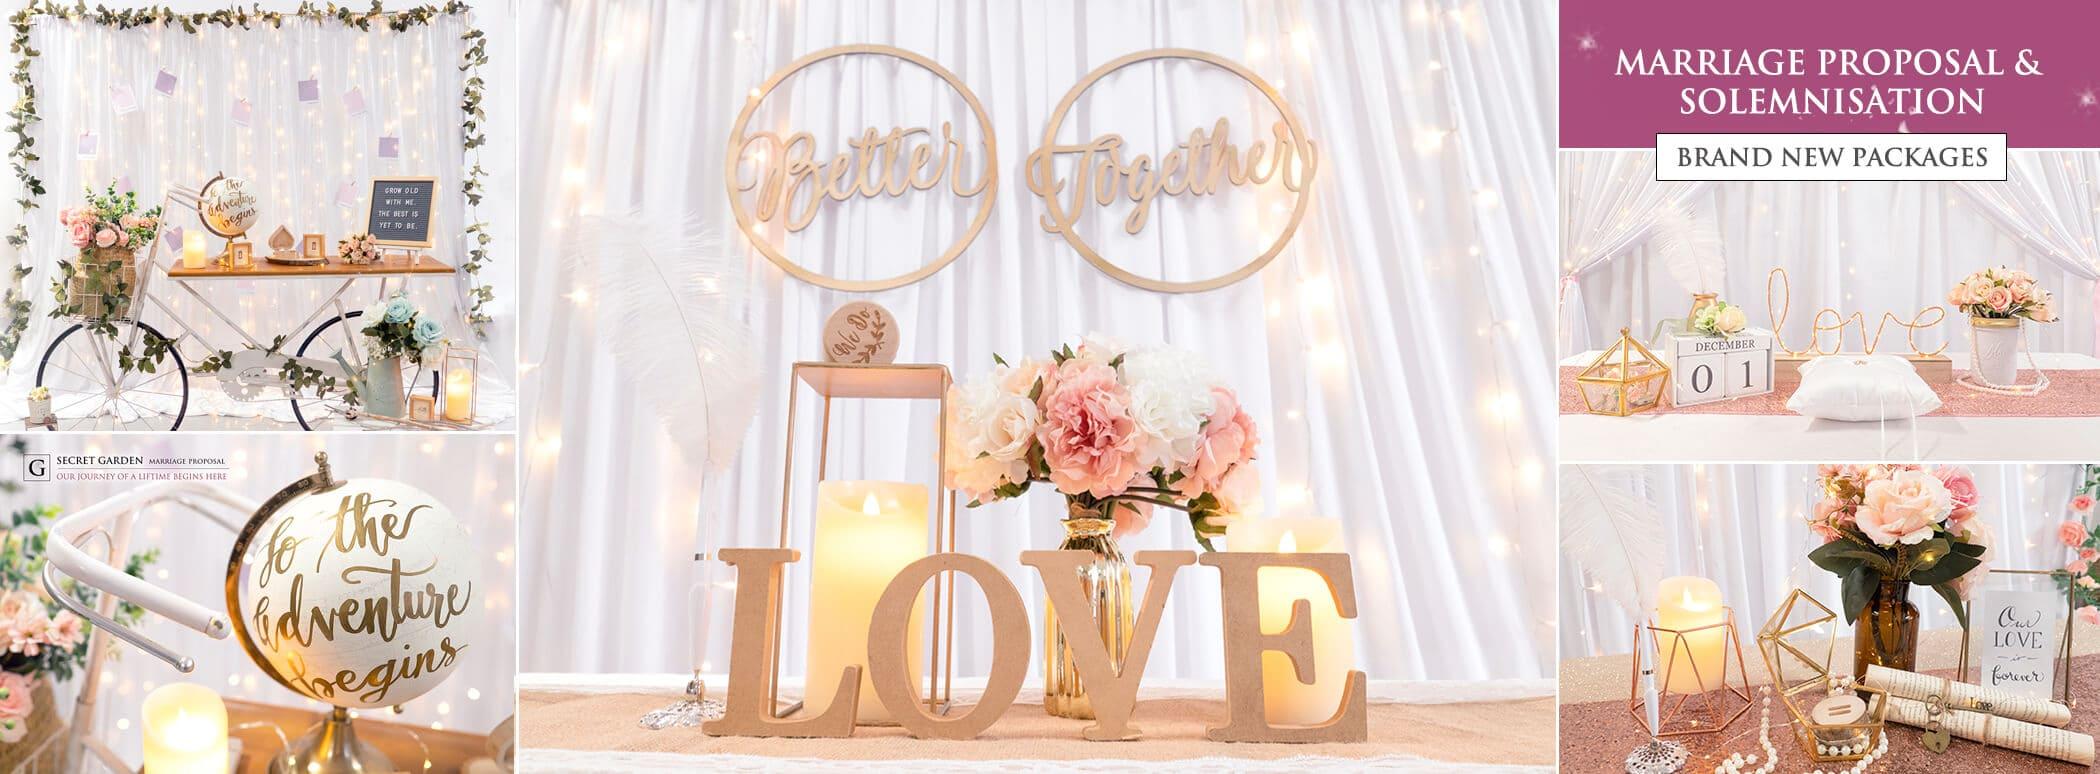 Dreamscaper Sg Singapore Wedding Decor Event Party Prop Rental